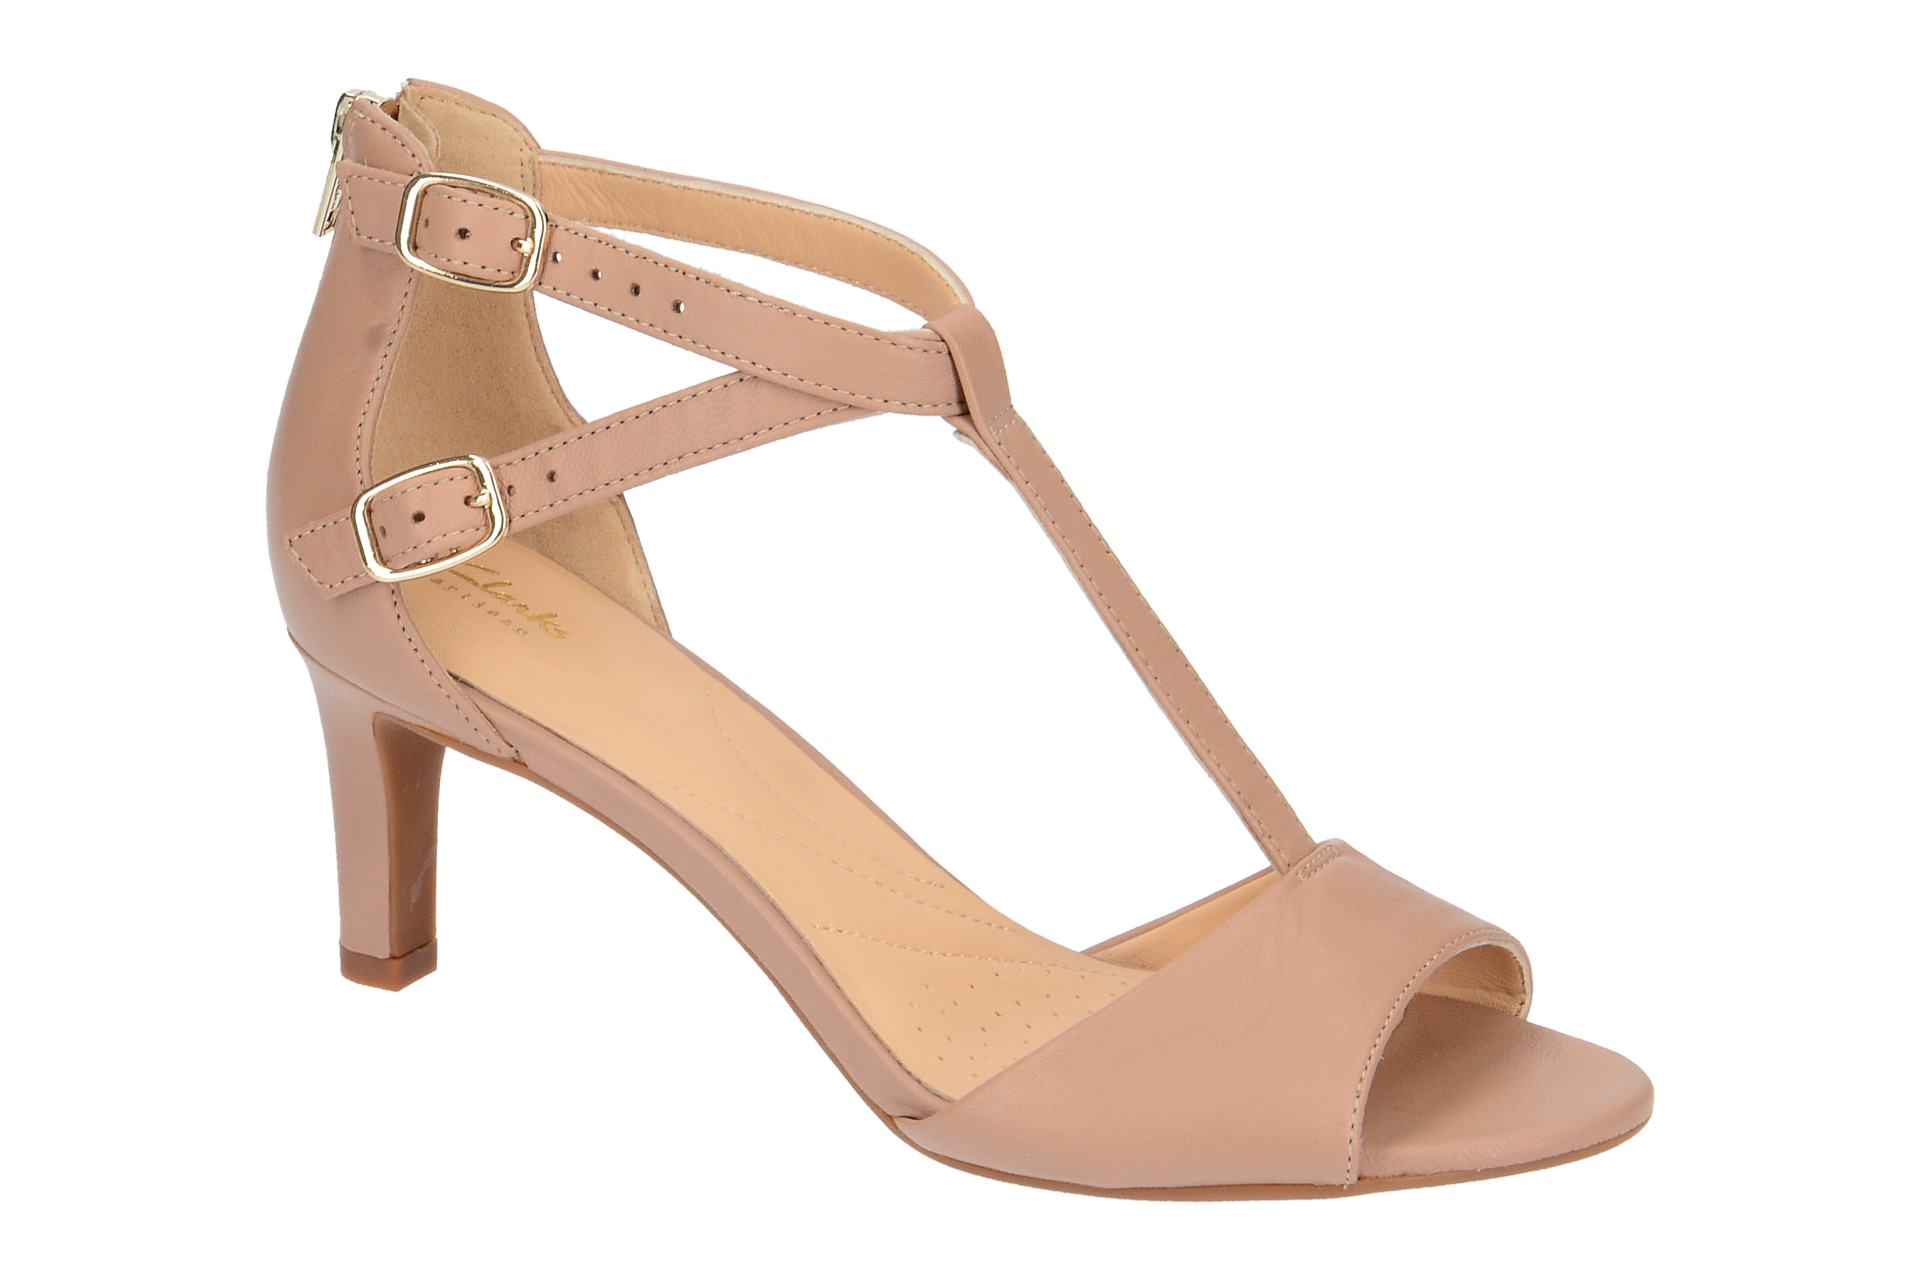 Clarks LAURETI PEARL Sandalette für Damen in rose - 26133787 4 (Gr. 35,5, 39, 39,5, 36)